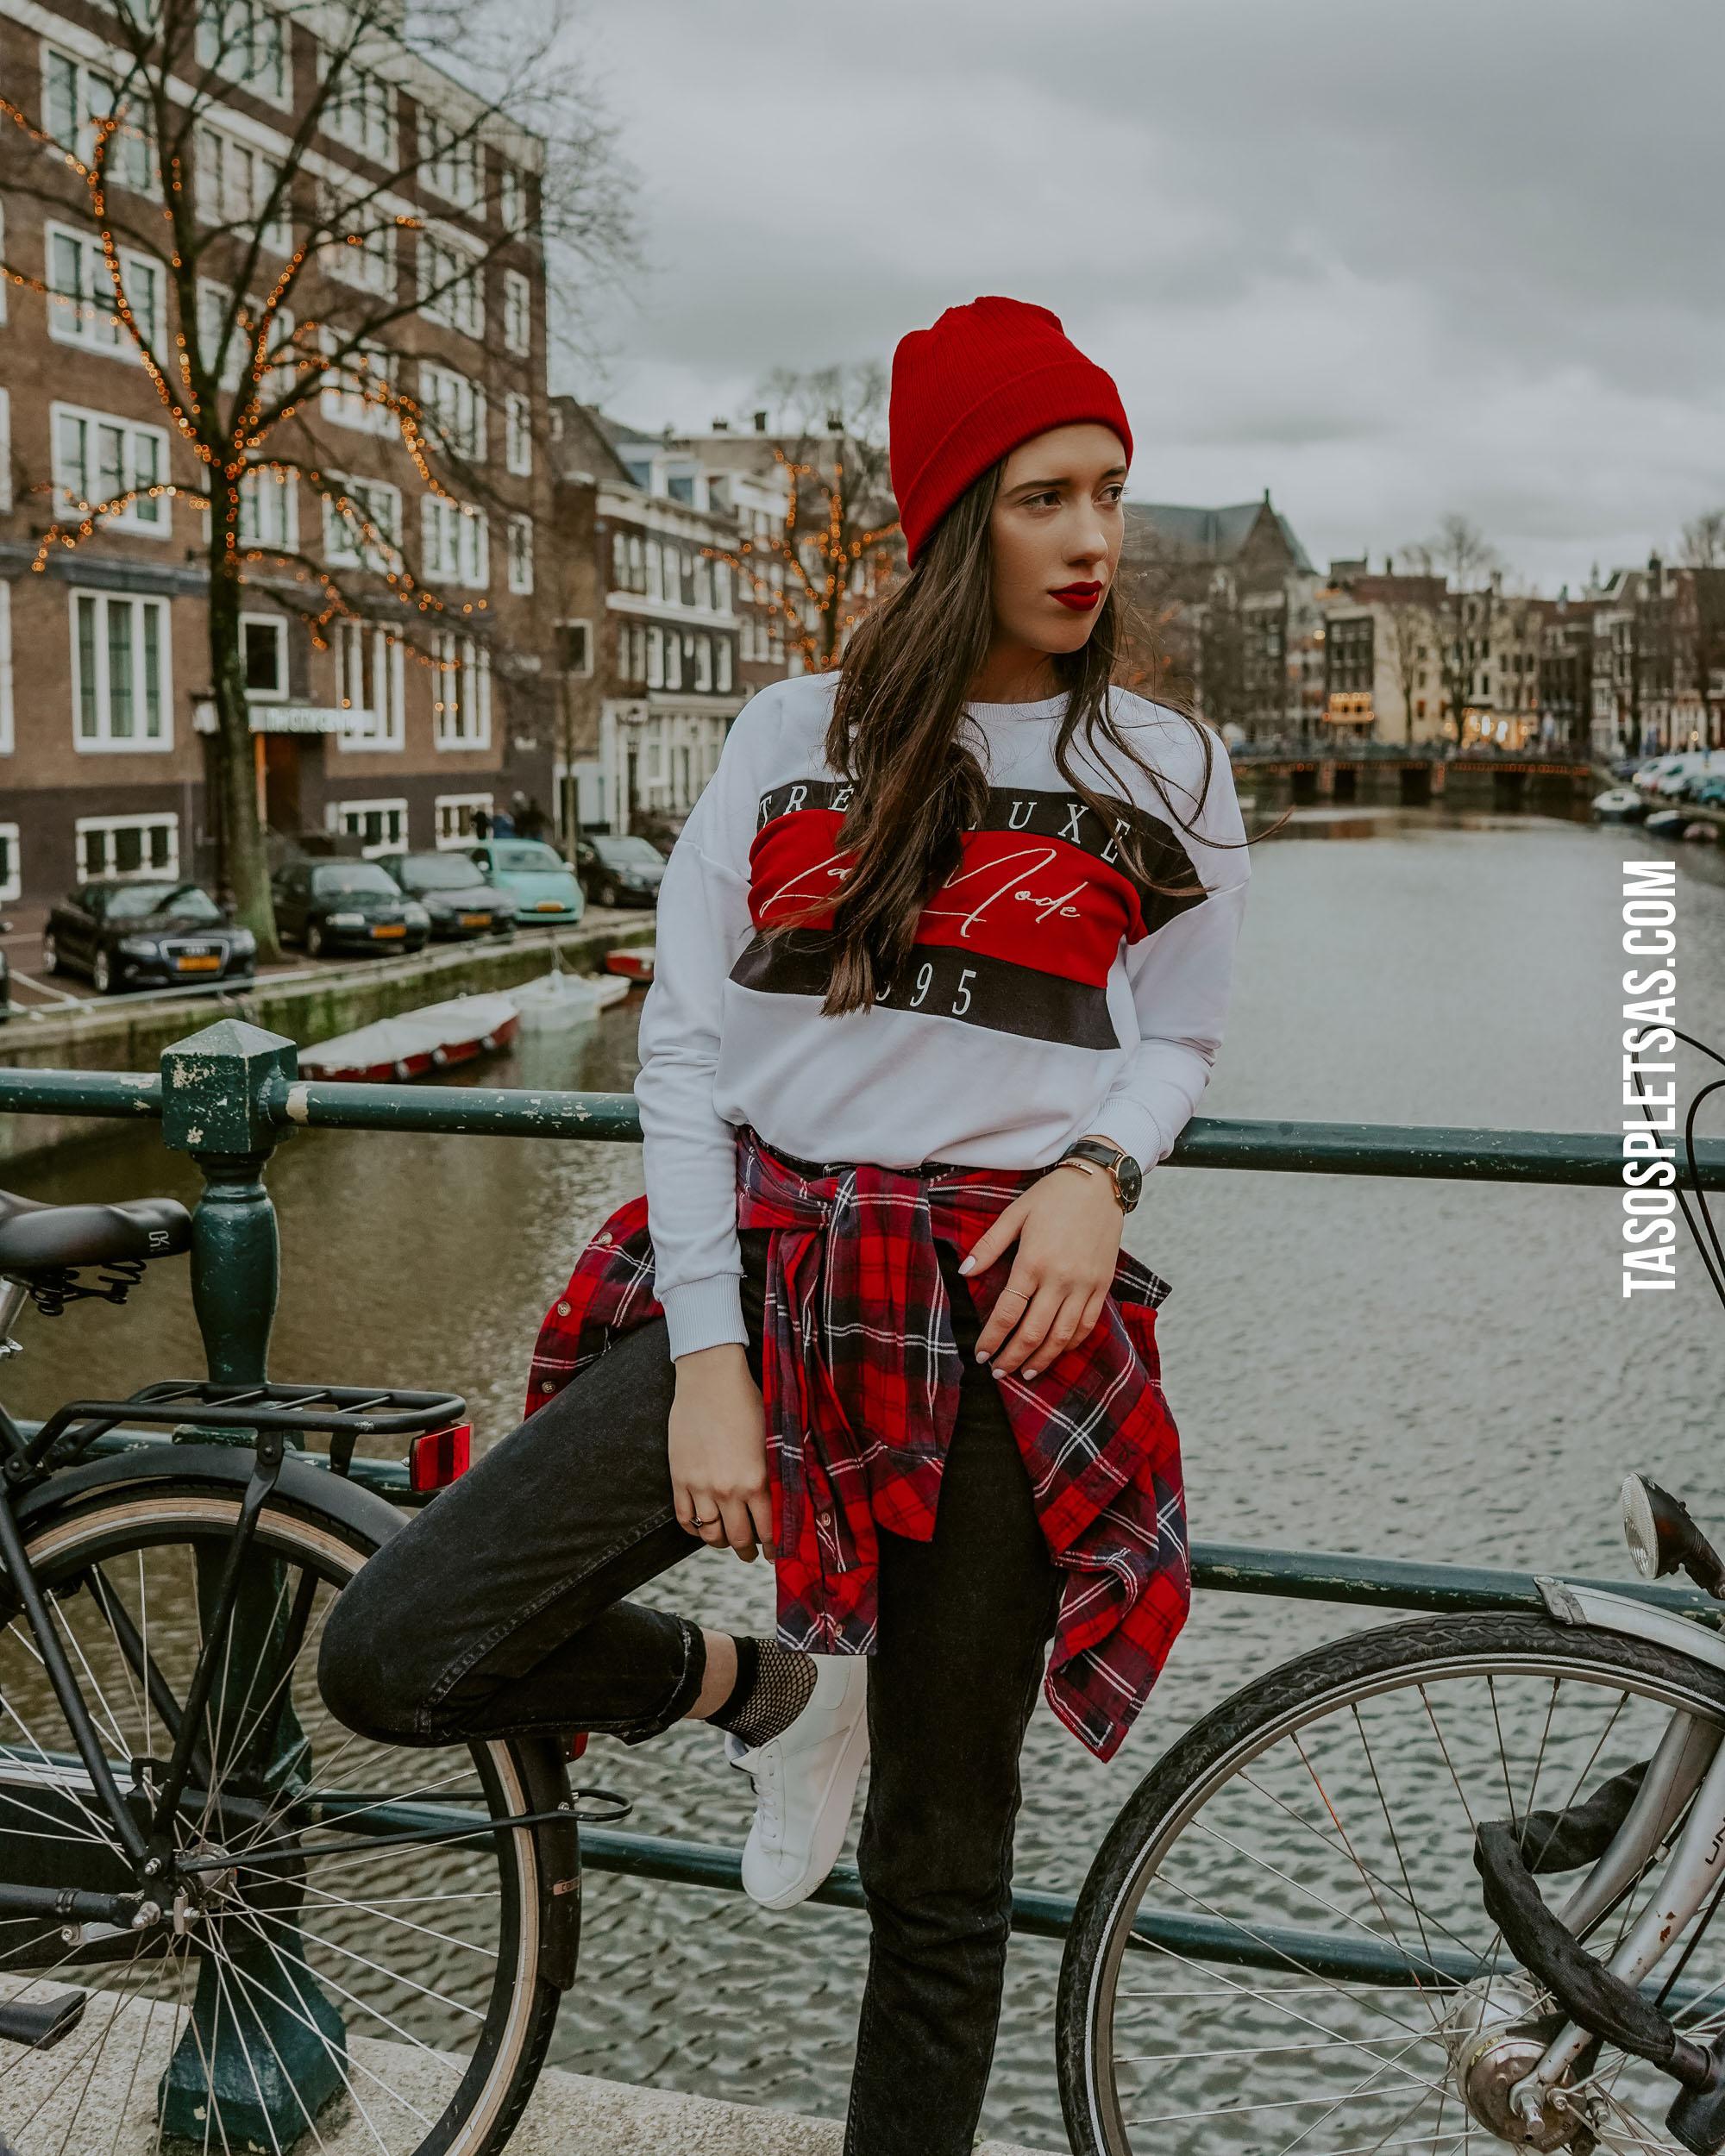 WEBSITE-Amsterdam-DSC00522 copy copy.jpg